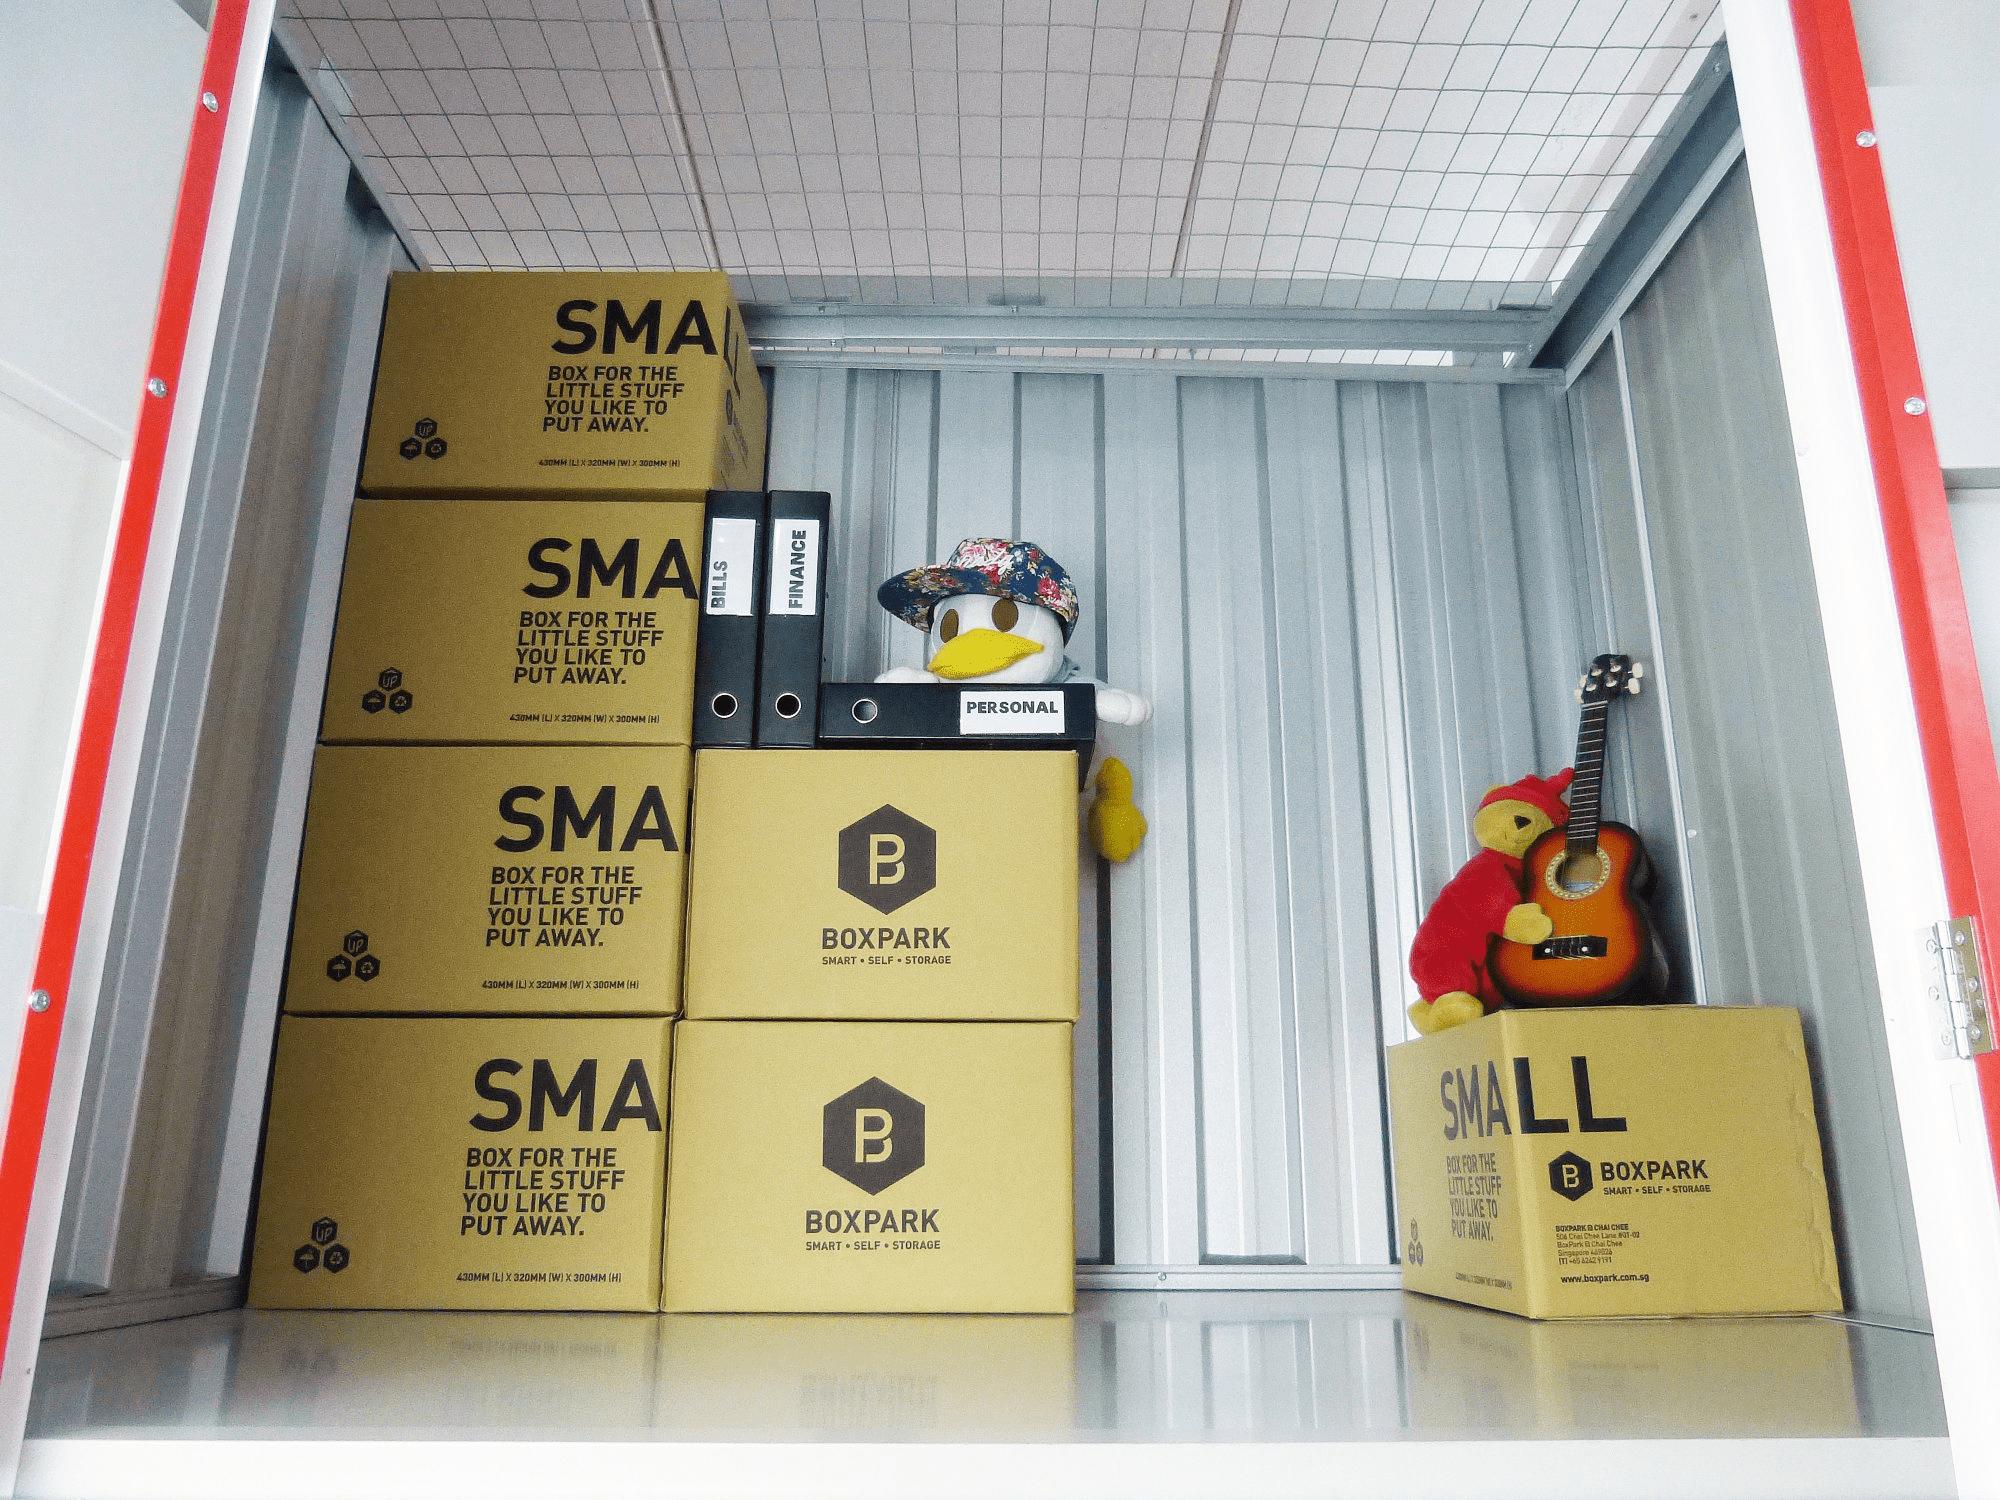 Storage spaces - Boxpark